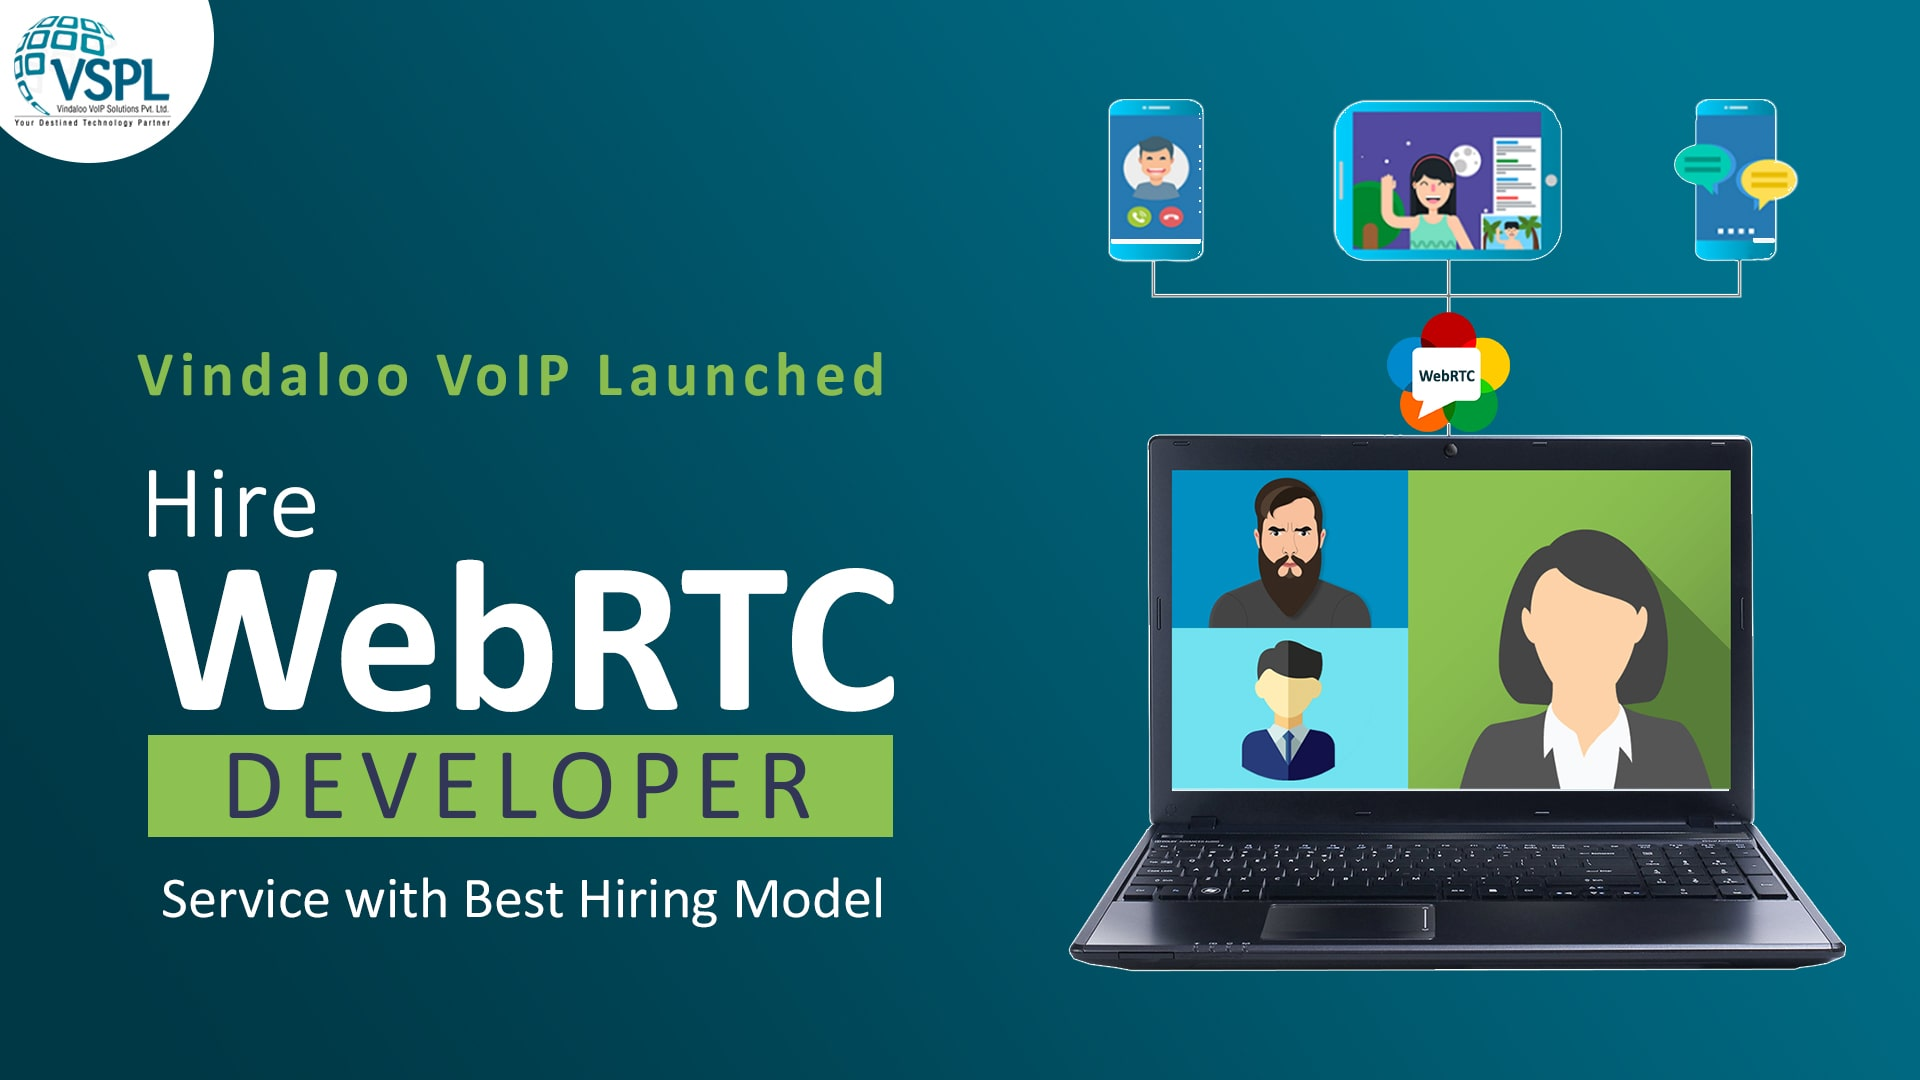 Vindaloo VoIP Launched Hire WebRTC Developer Service with Best Hiring Model